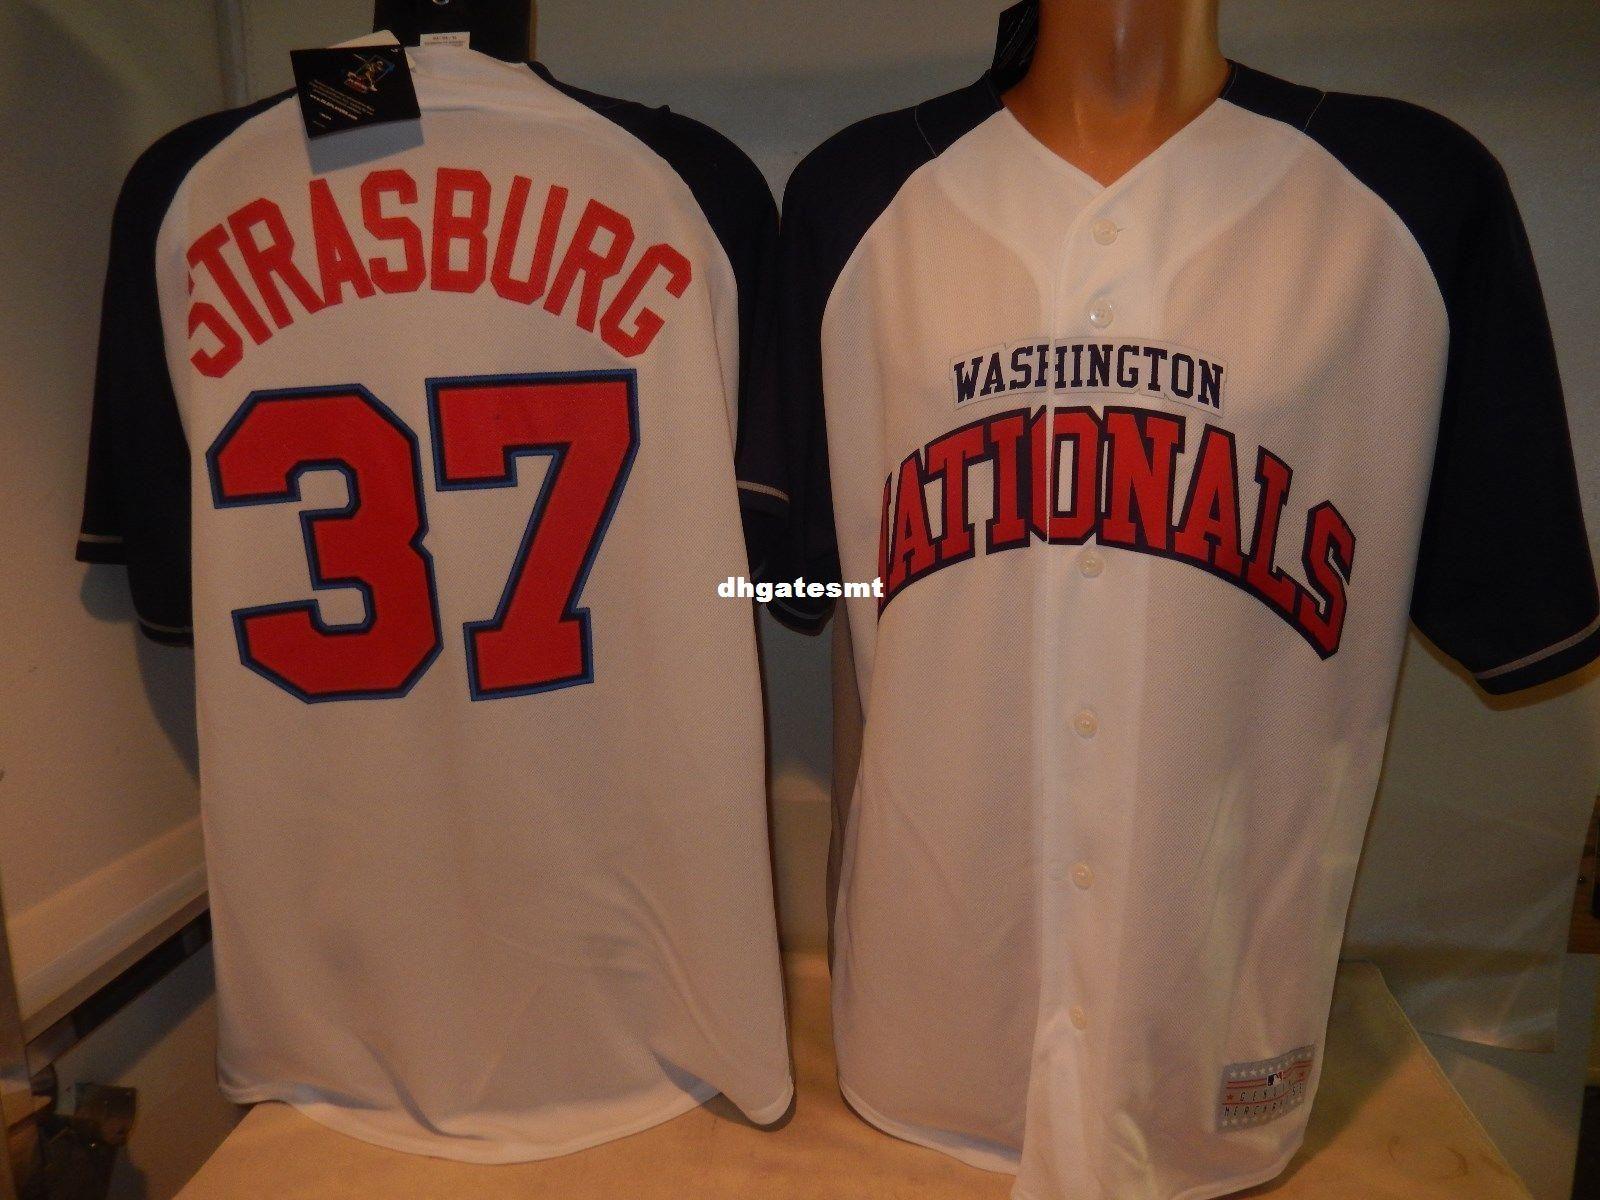 d35d2063aa5 Wholesale Cheap MAJESTIC Washington  37 STEPHEN STRASBURG Baseball Jersey  NEW Mens Stitched Jerseys Cheap Jersey Wholesale Jersey Baseball Jersey  Online ...